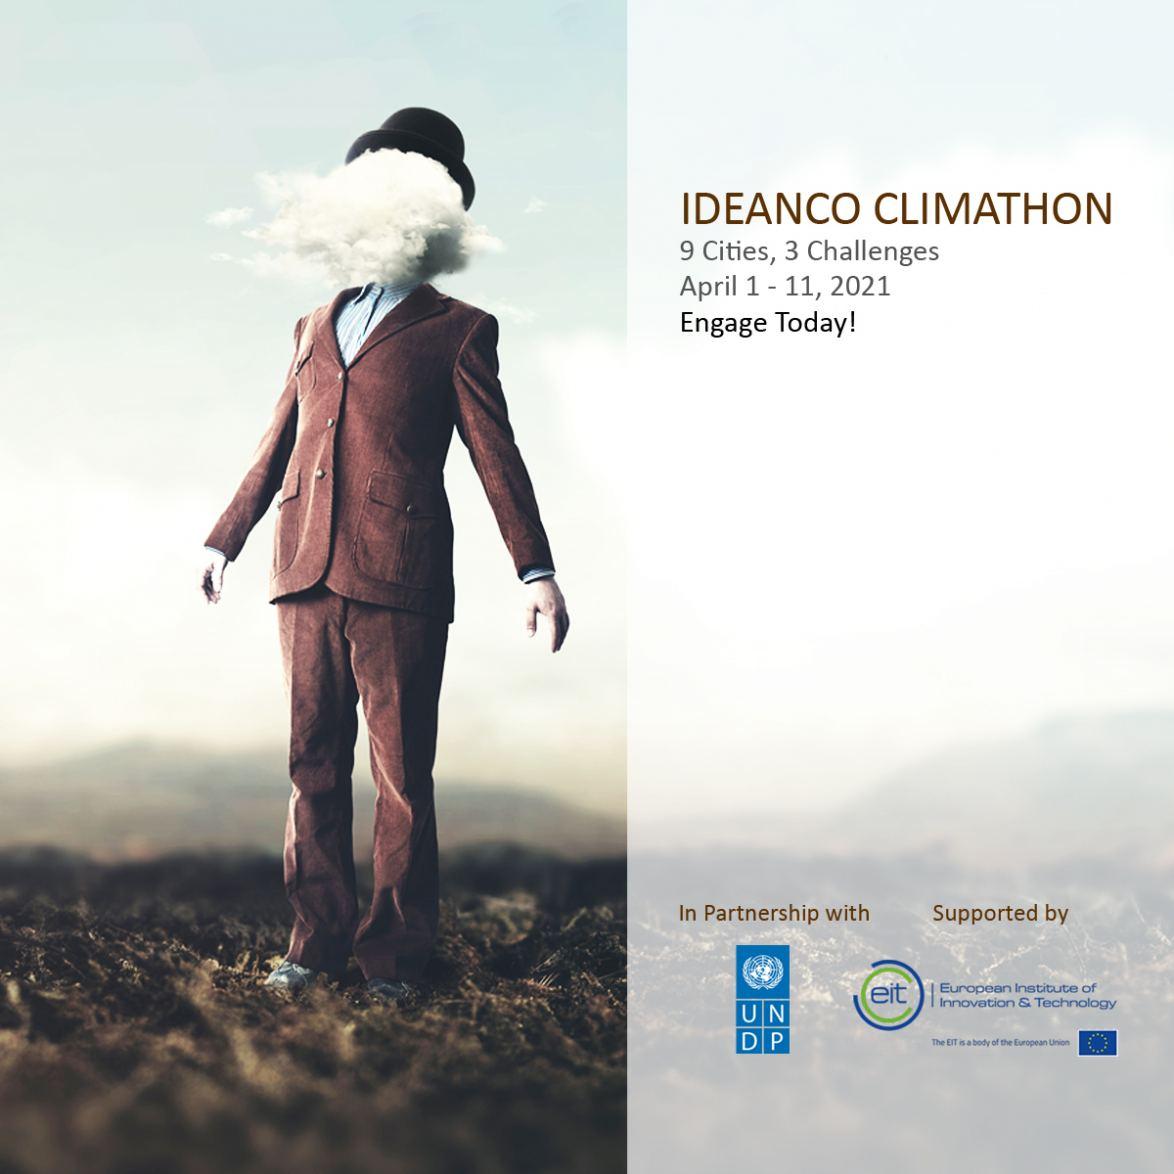 Undp Ideanco Climathon